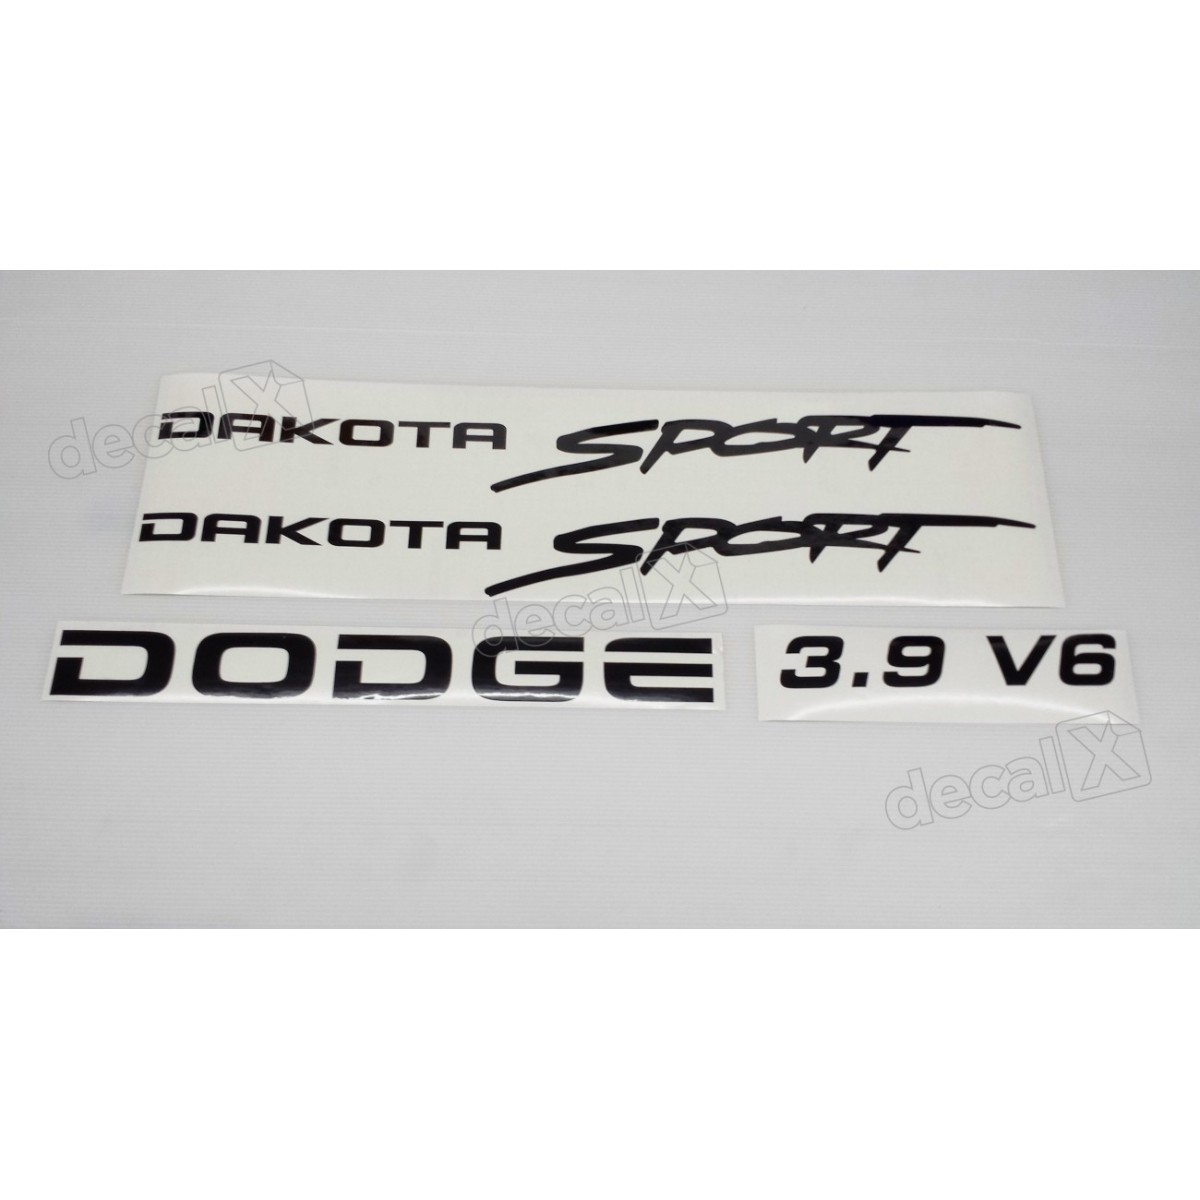 Kit Adesivos Dodge Dakota Sport 3.9 V6 Em Preto Decalx